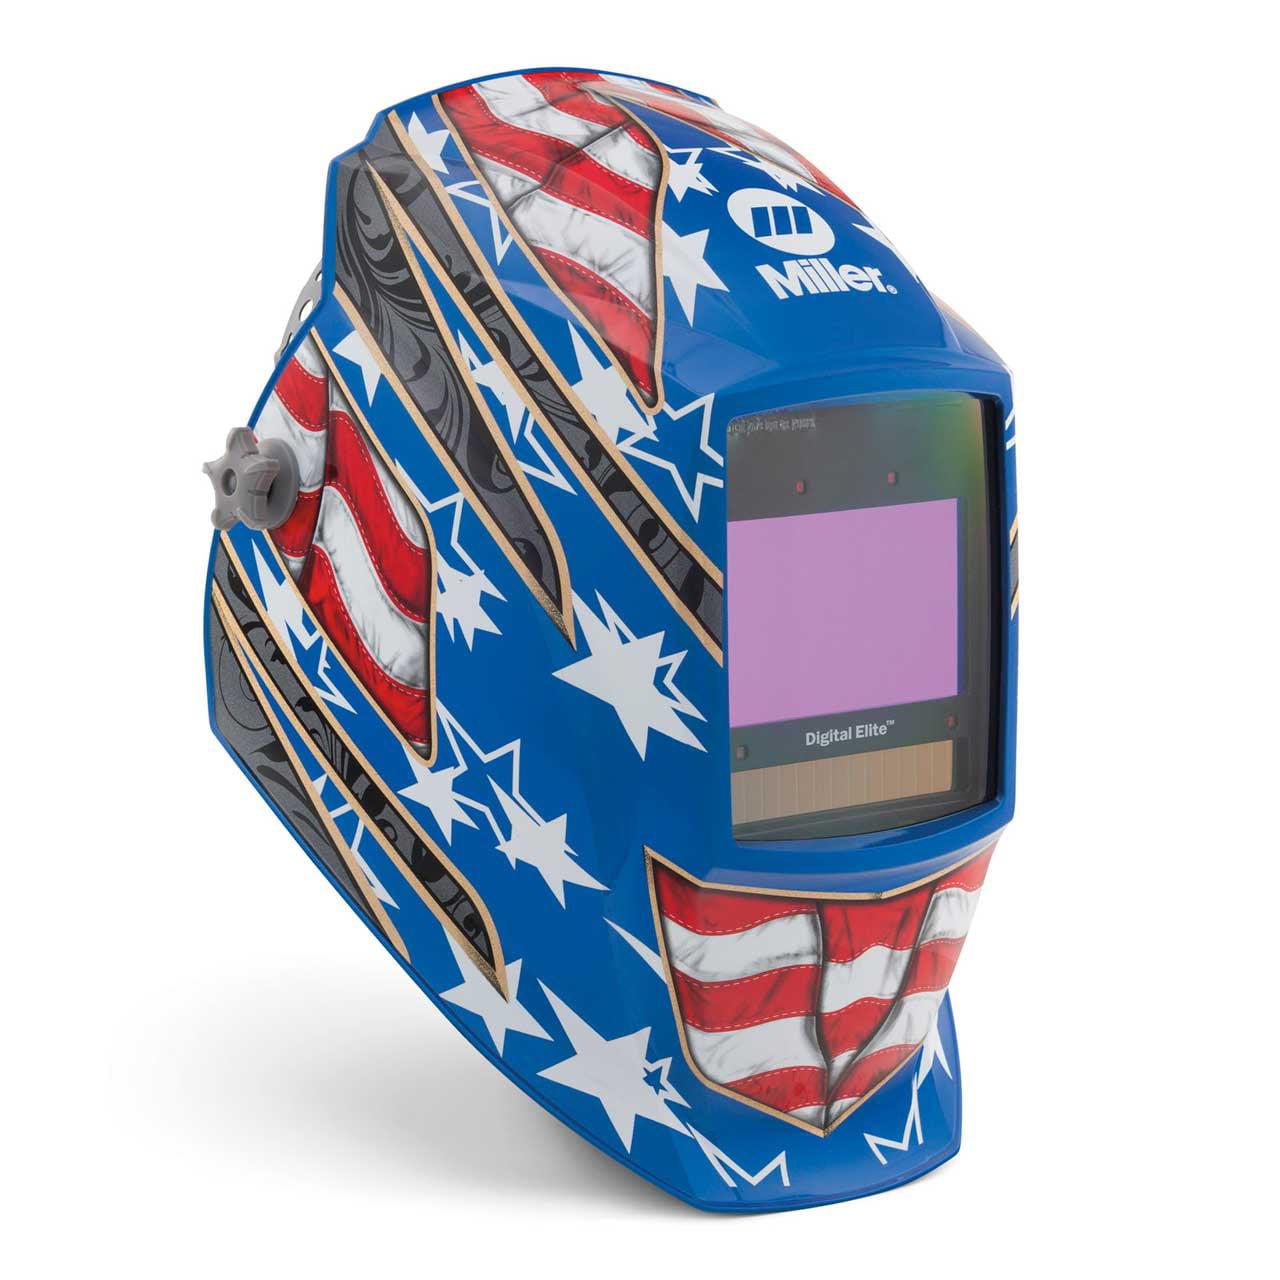 Miller 281002 Digital Elite Welding Helmet with ClearLight Lens, Stars & Stripes III